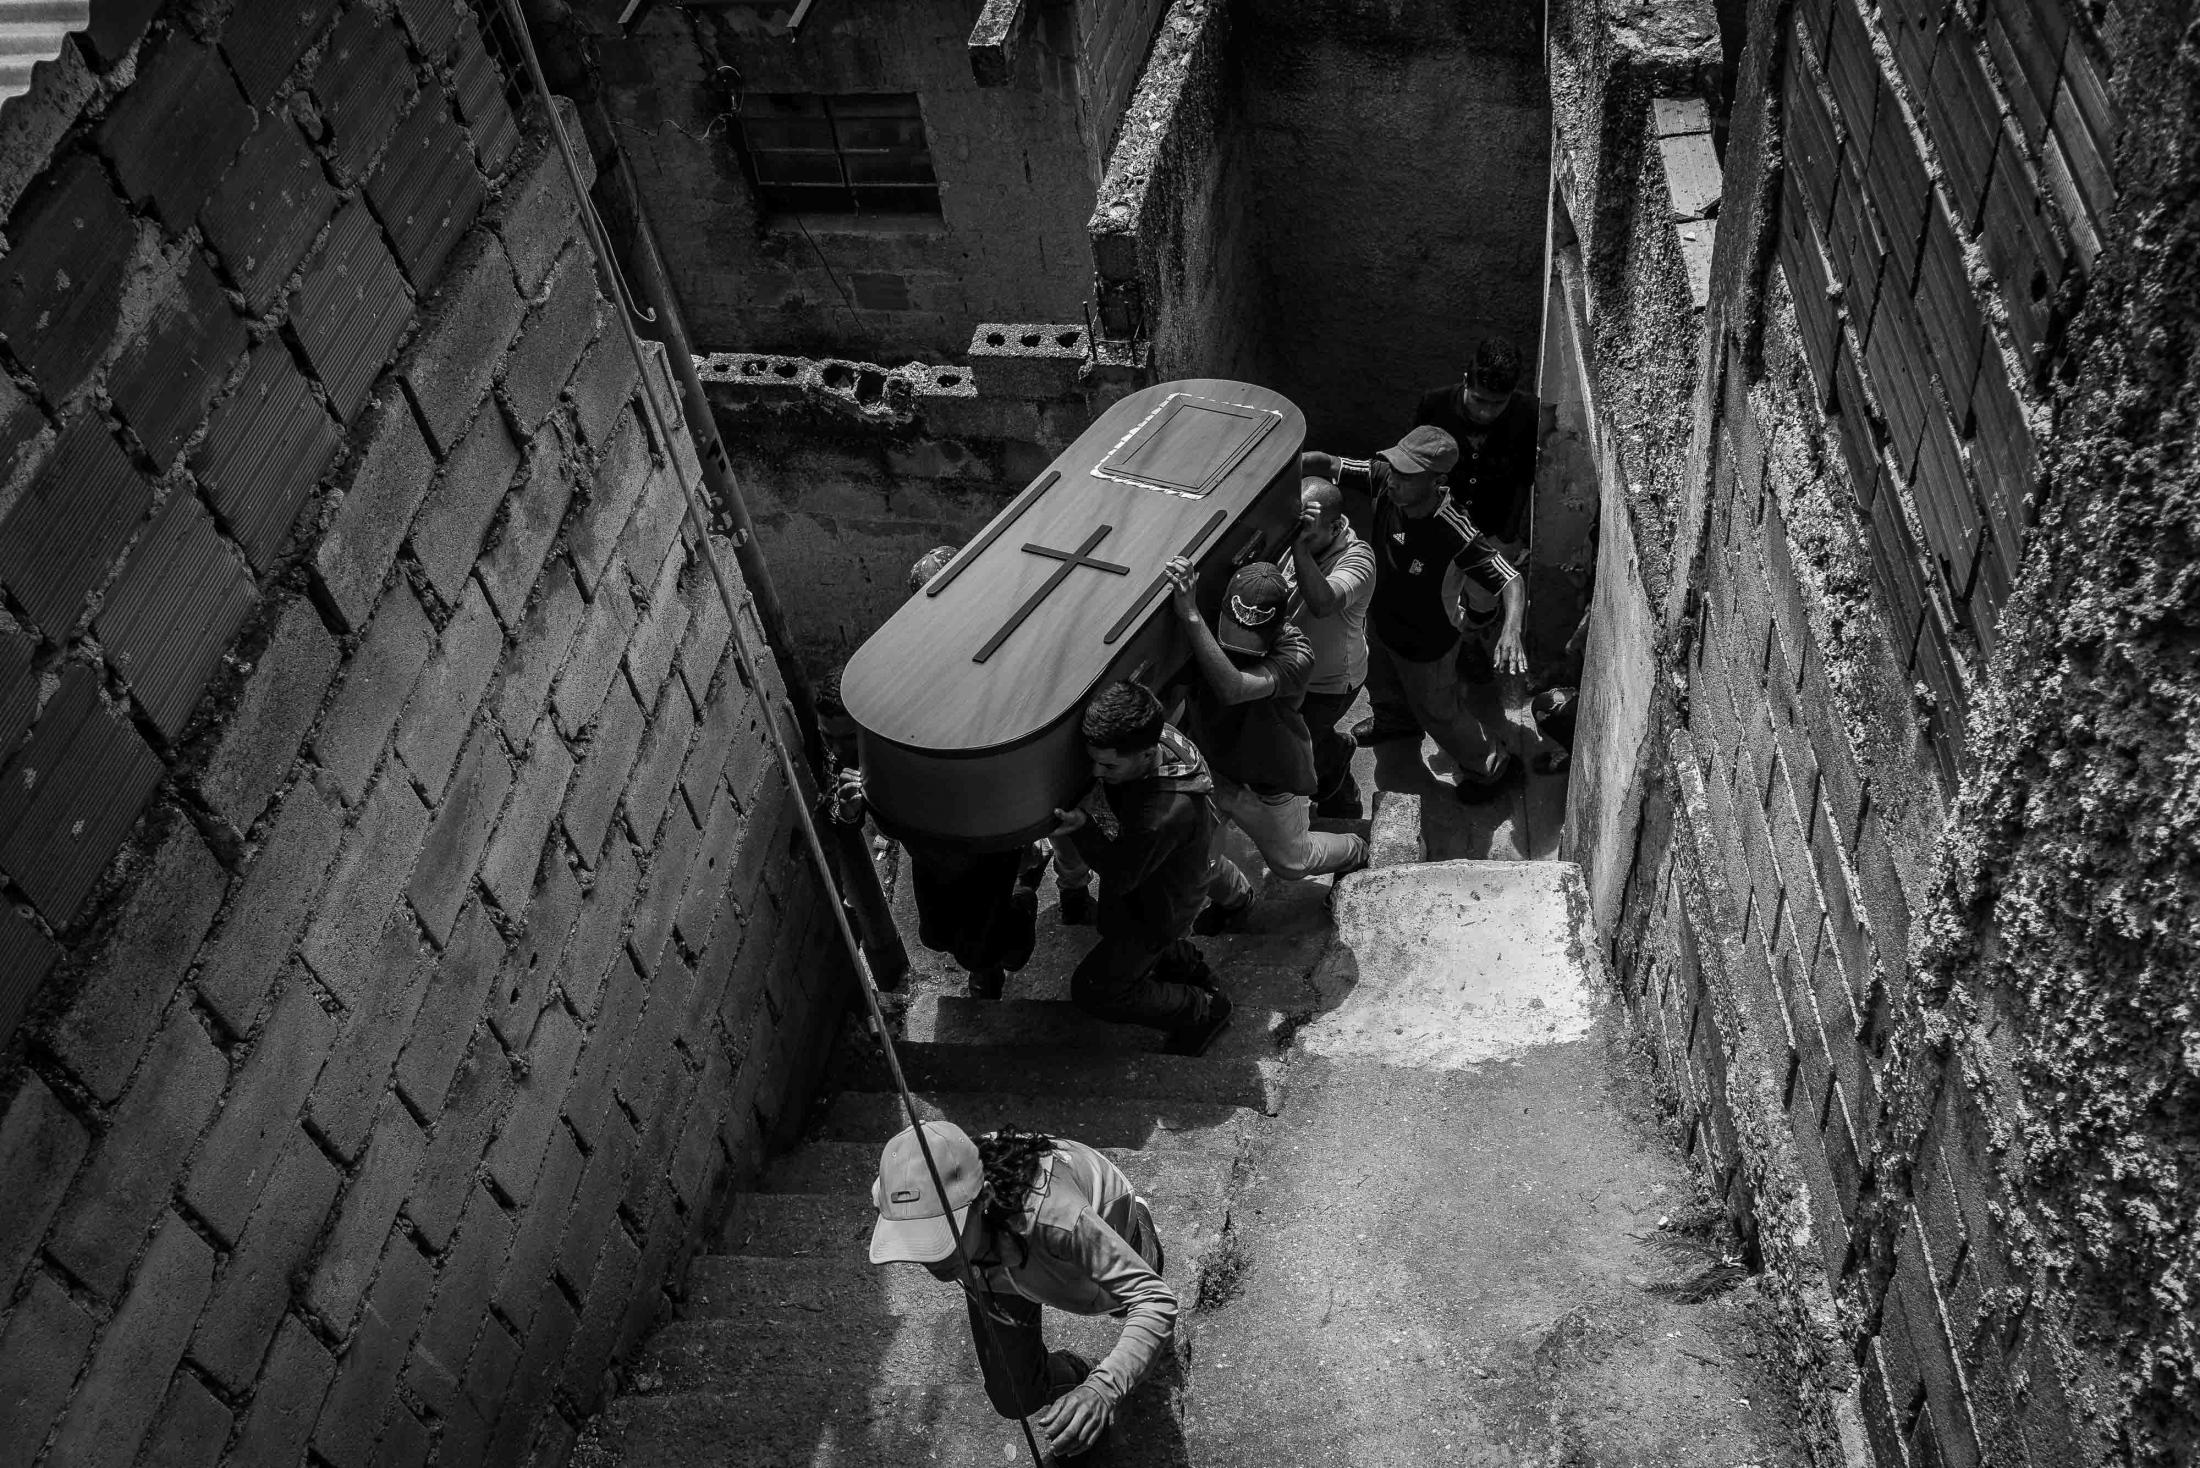 Art and Documentary Photography - Loading Hunger_Crimes_-_ignacio-marin.com-27.jpg